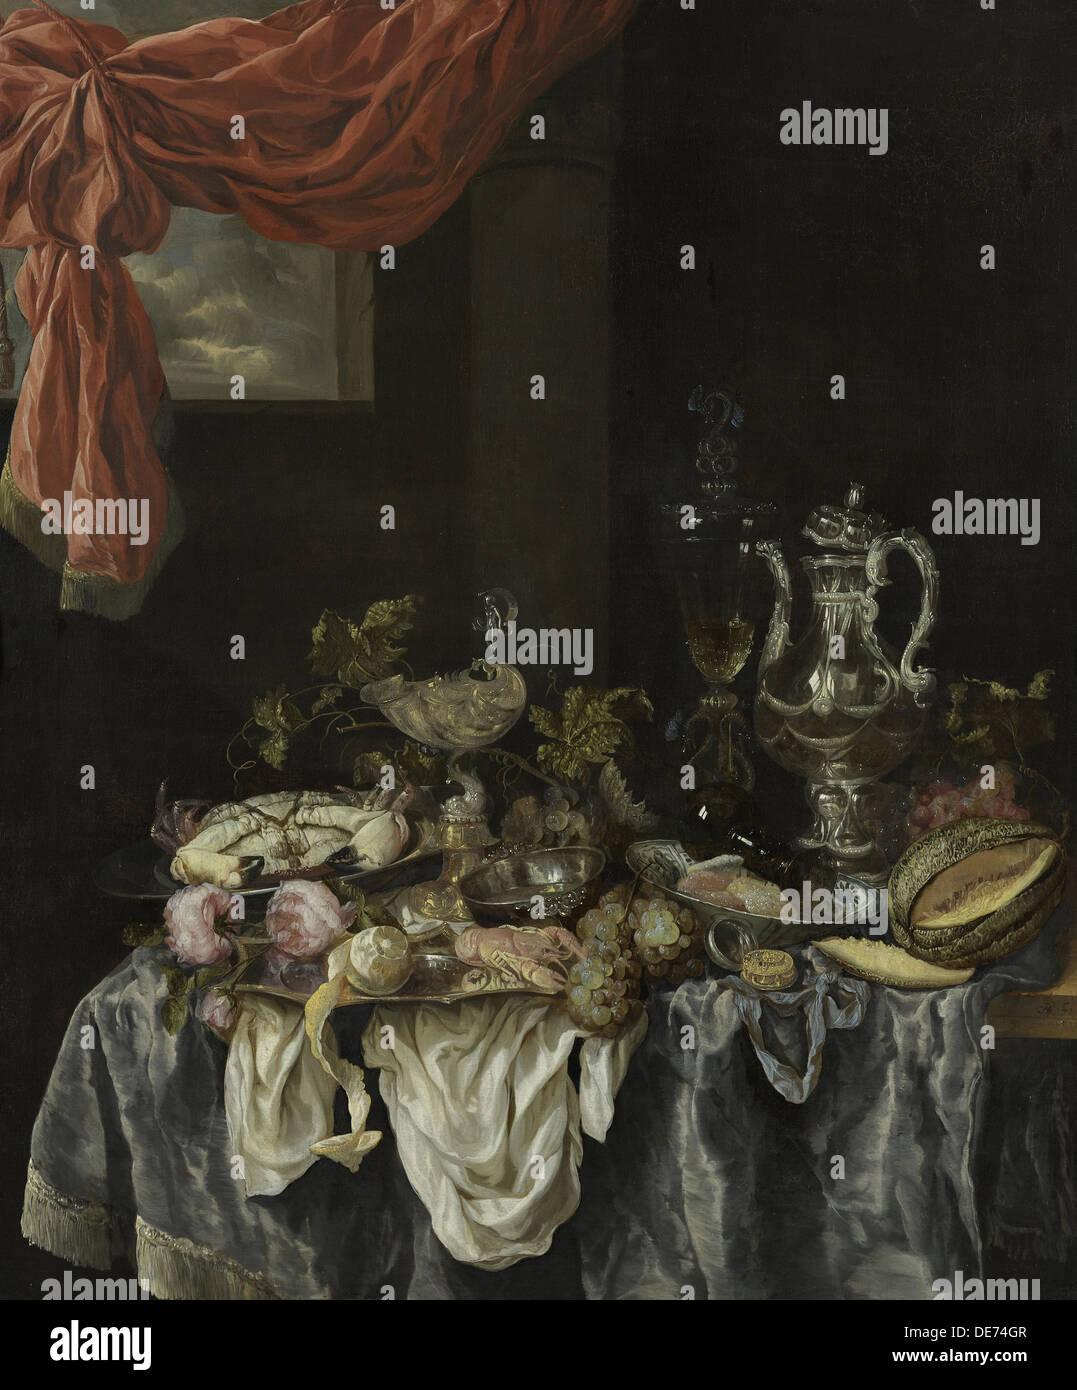 La vie toujours somptueux, 1654. Artiste: Beijeren, Abraham Hendricksz, van (1620/21-1690) Photo Stock